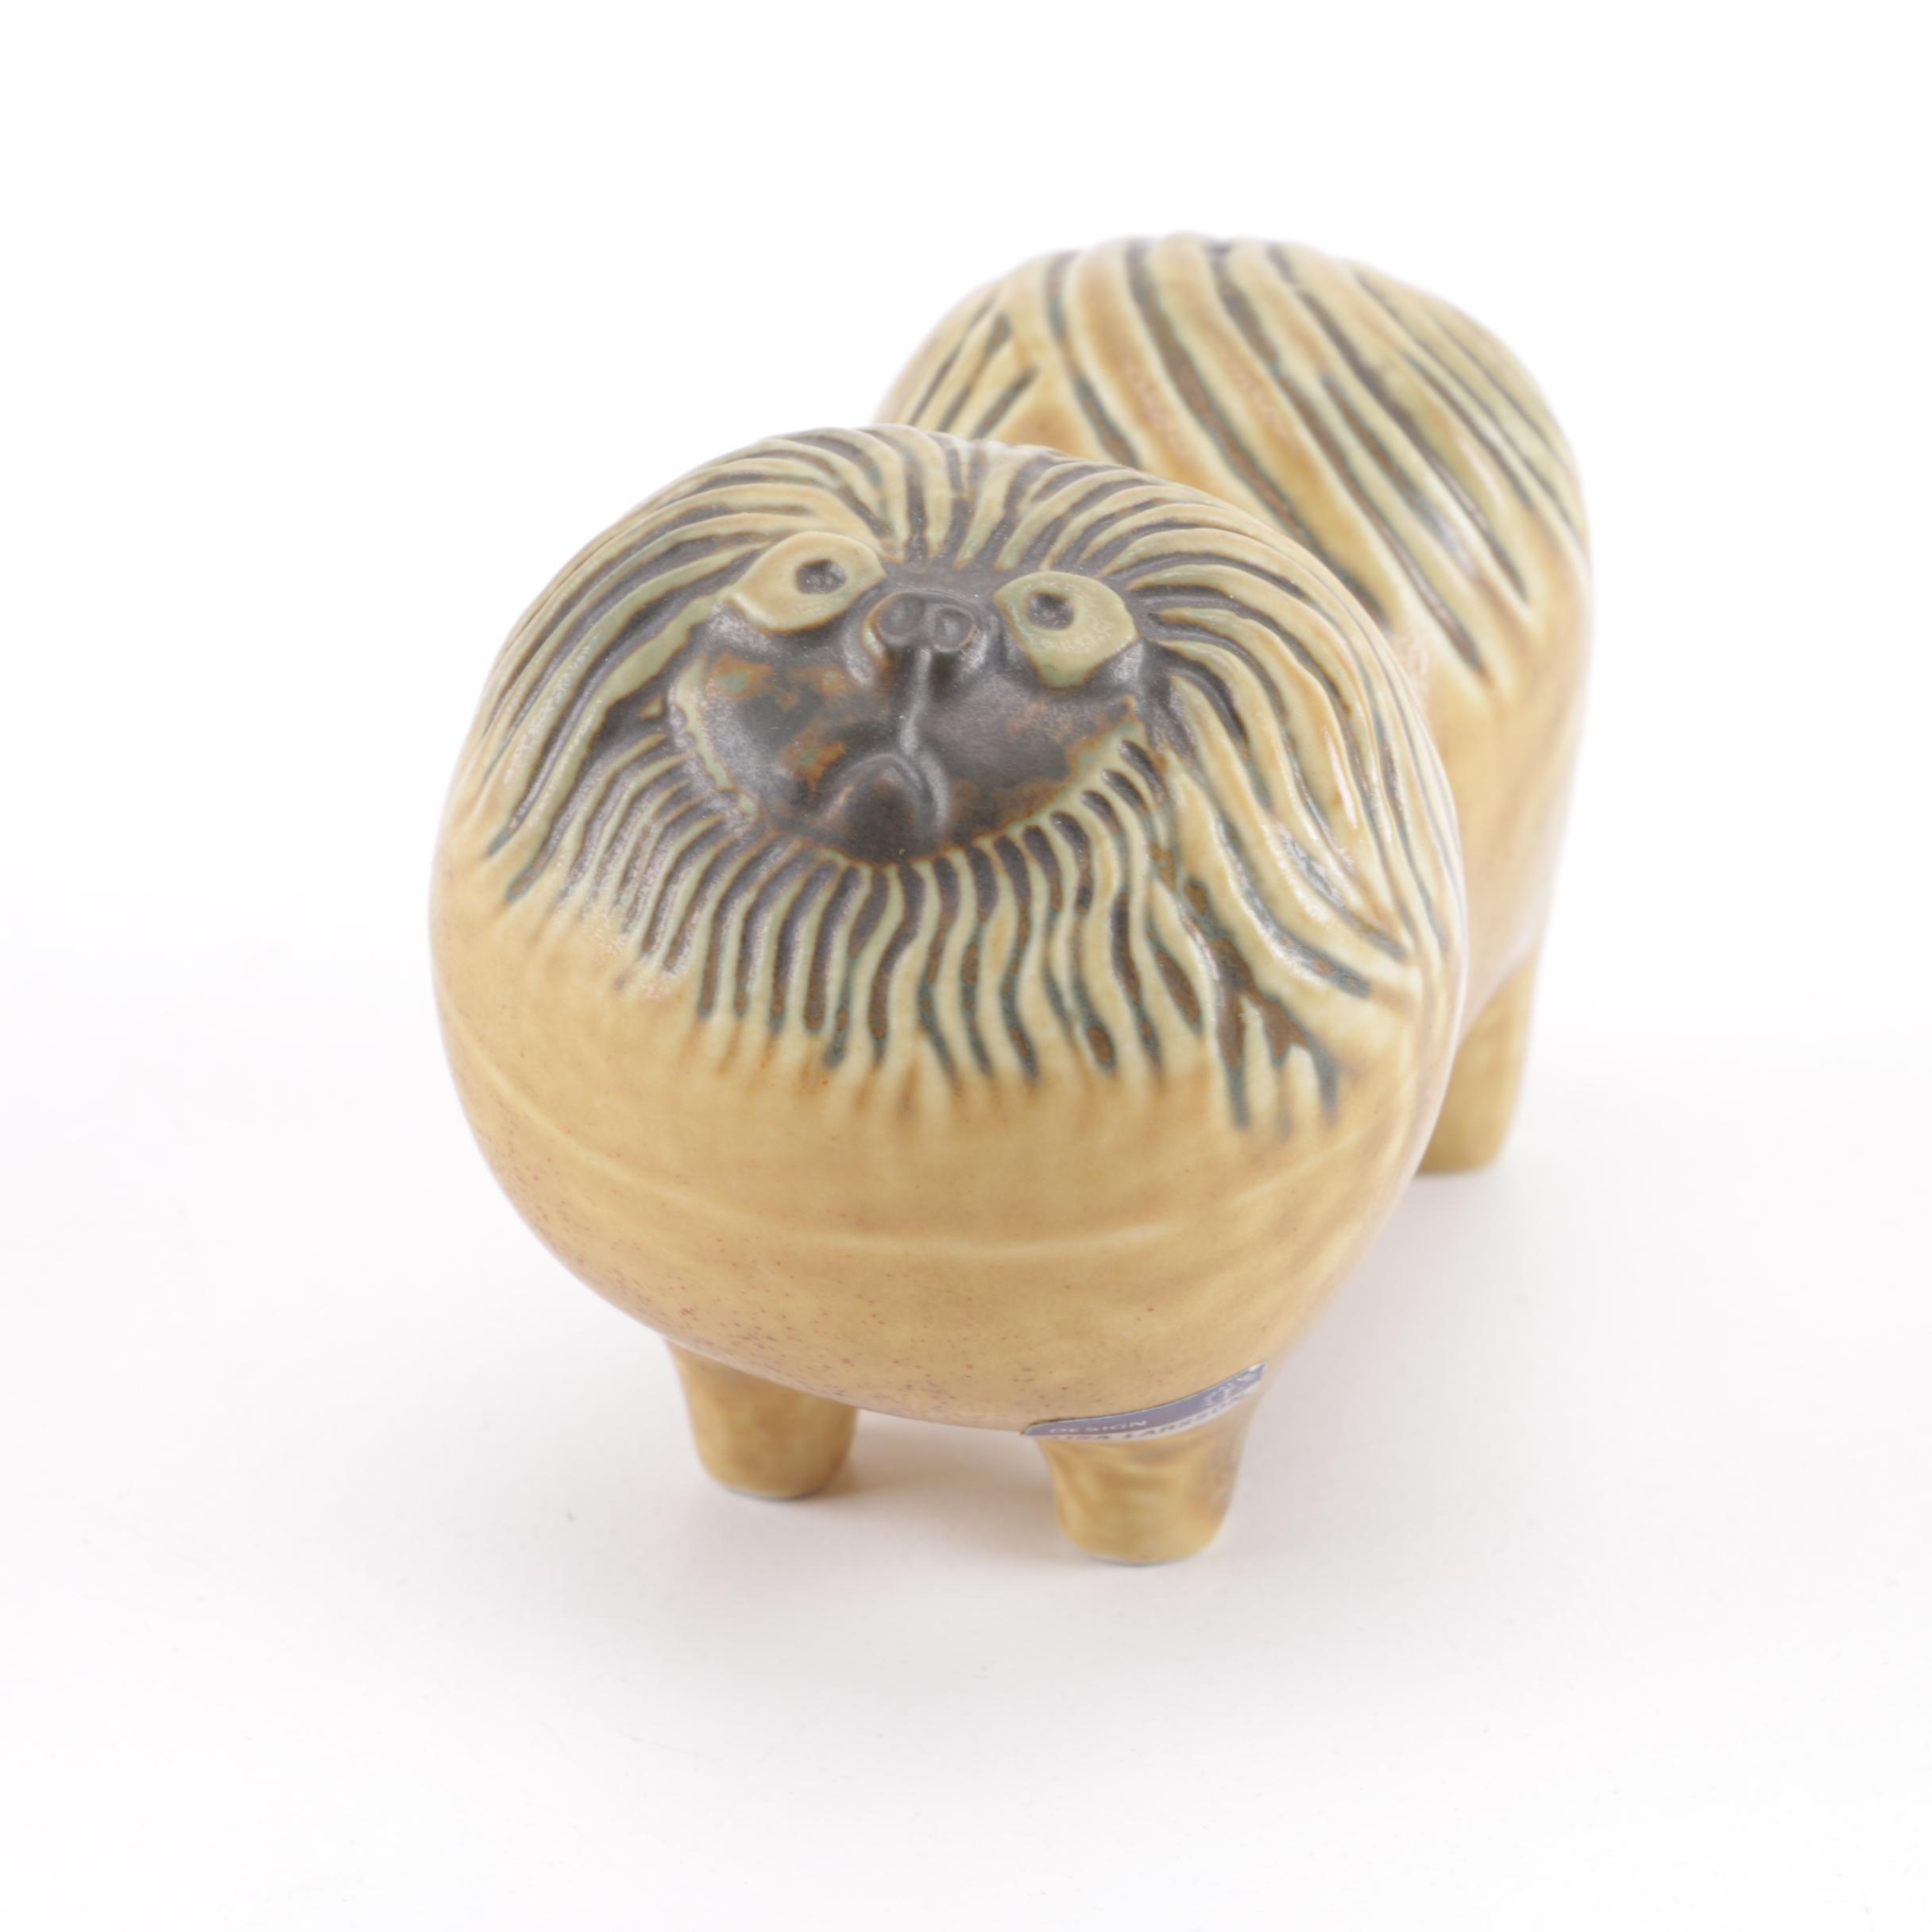 Ceramic Dog Figurine by Lisa Larsson for Gustavsberg